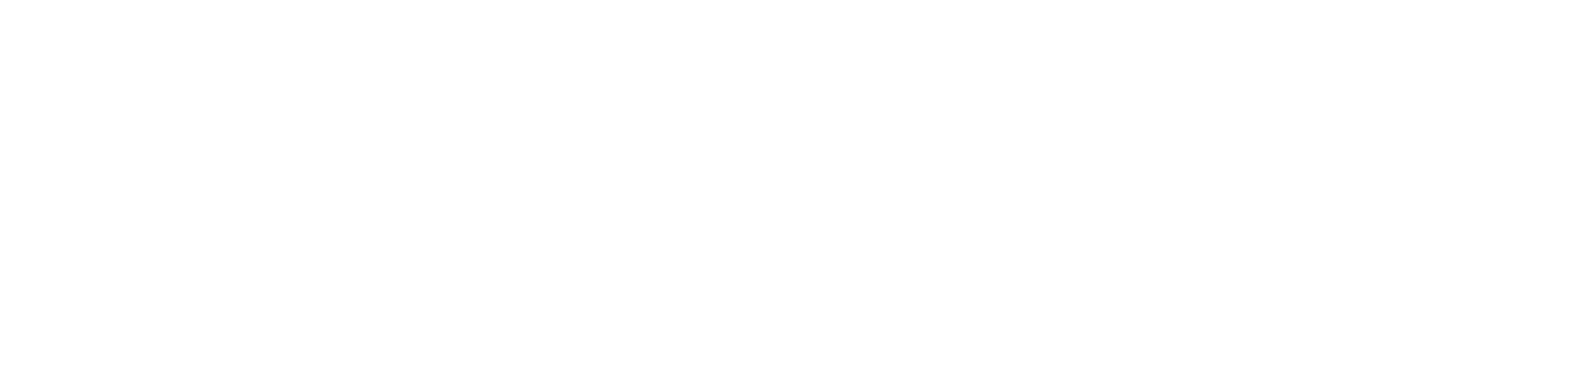 South Tyneside and Sunderland NHS Trust Logo